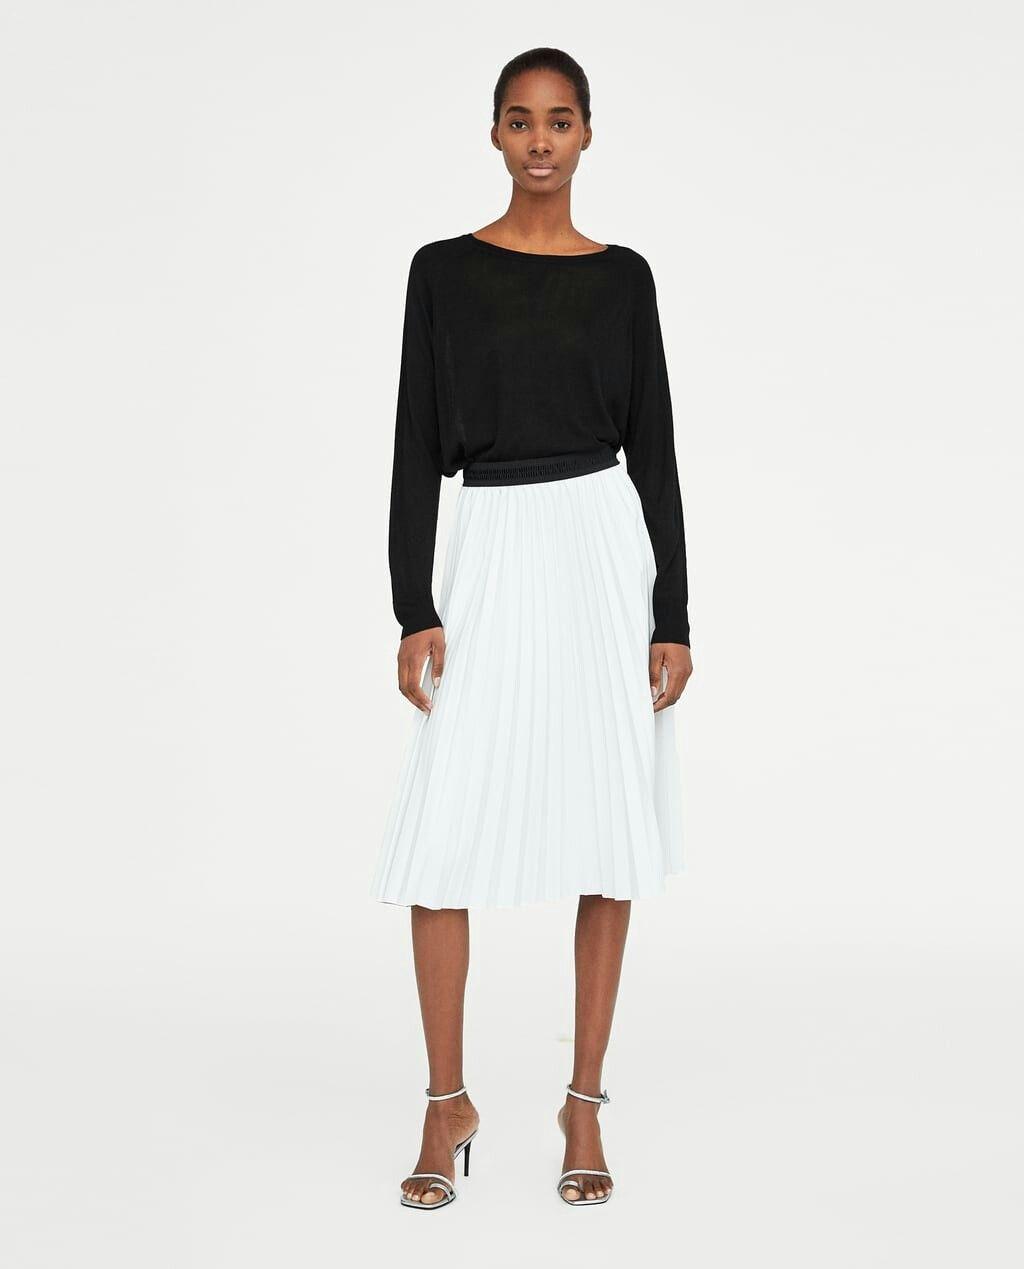 da1aa2a0bf Zara faux leather white pleated skirt | MINE | White pleated skirt ...